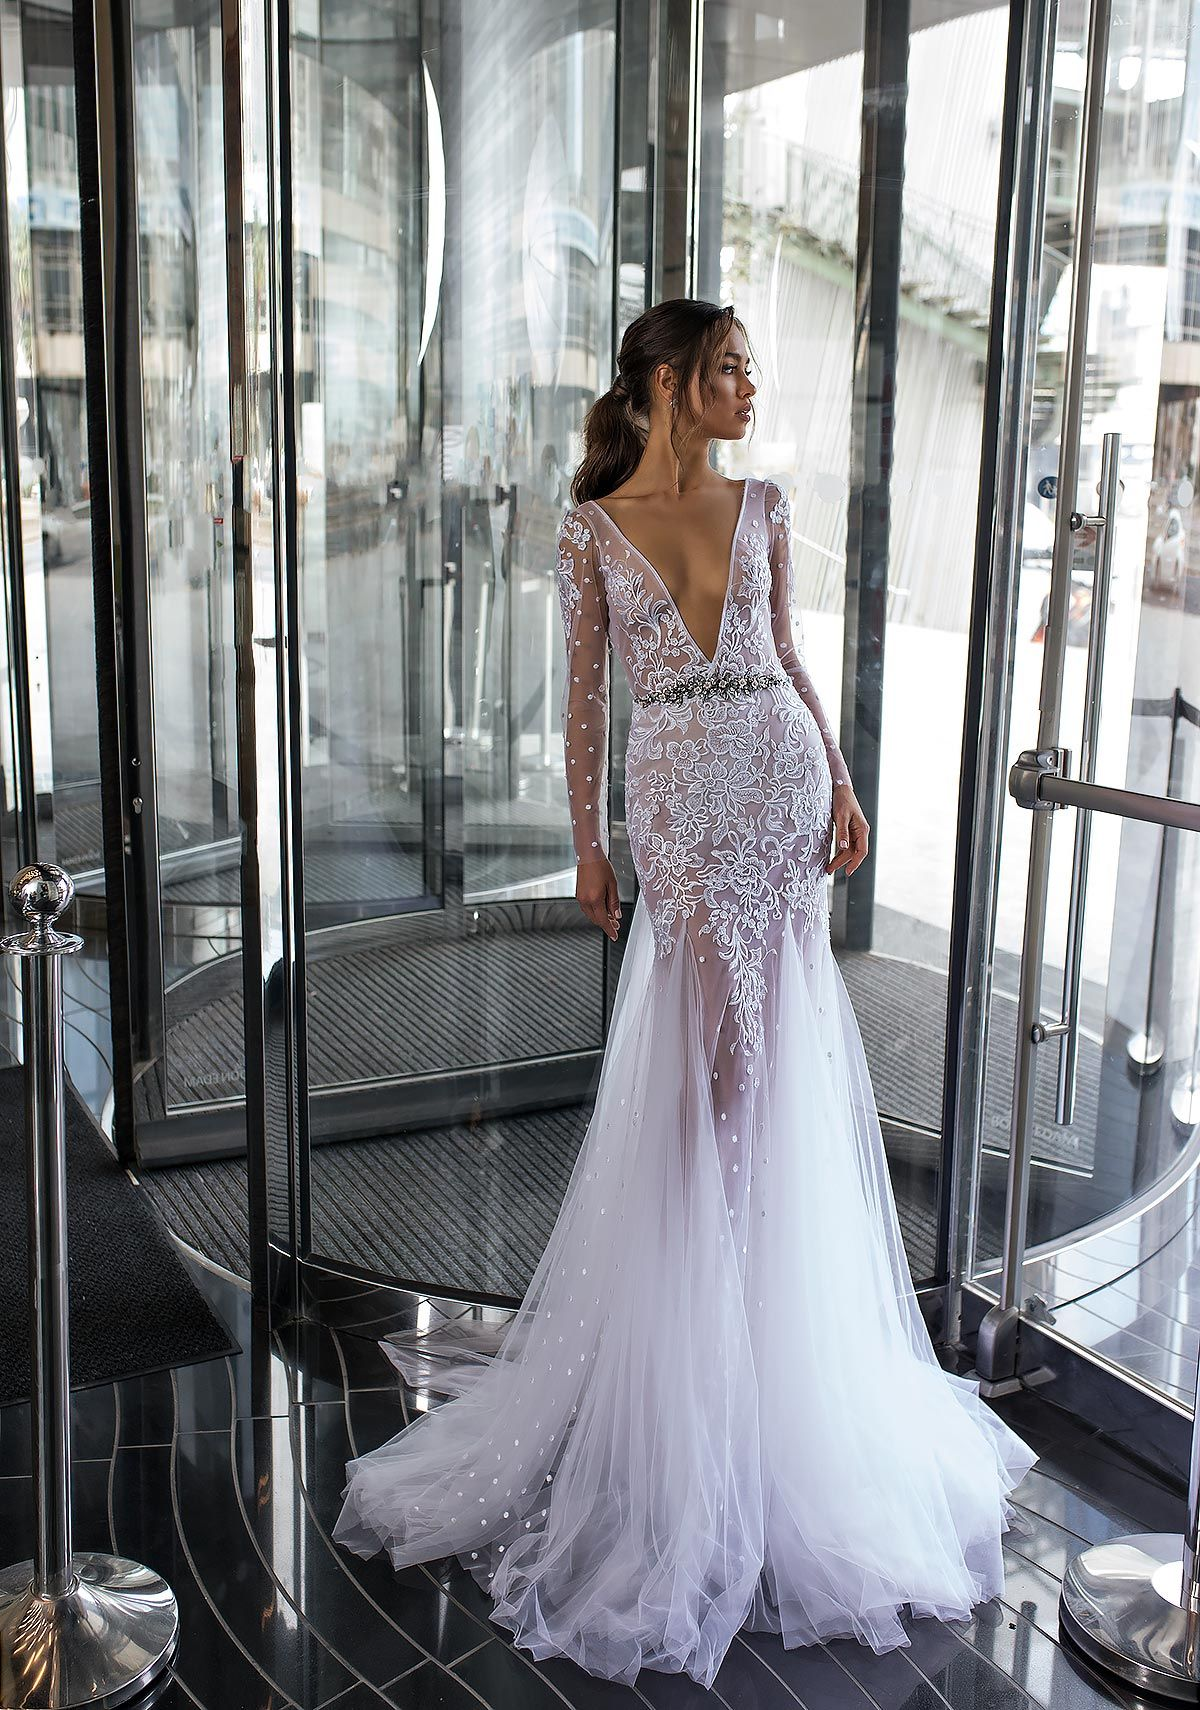 The lightbox wedding dresses  Royal Collection  Dimitrius Dalia   Νυφικά  Pinterest  Video